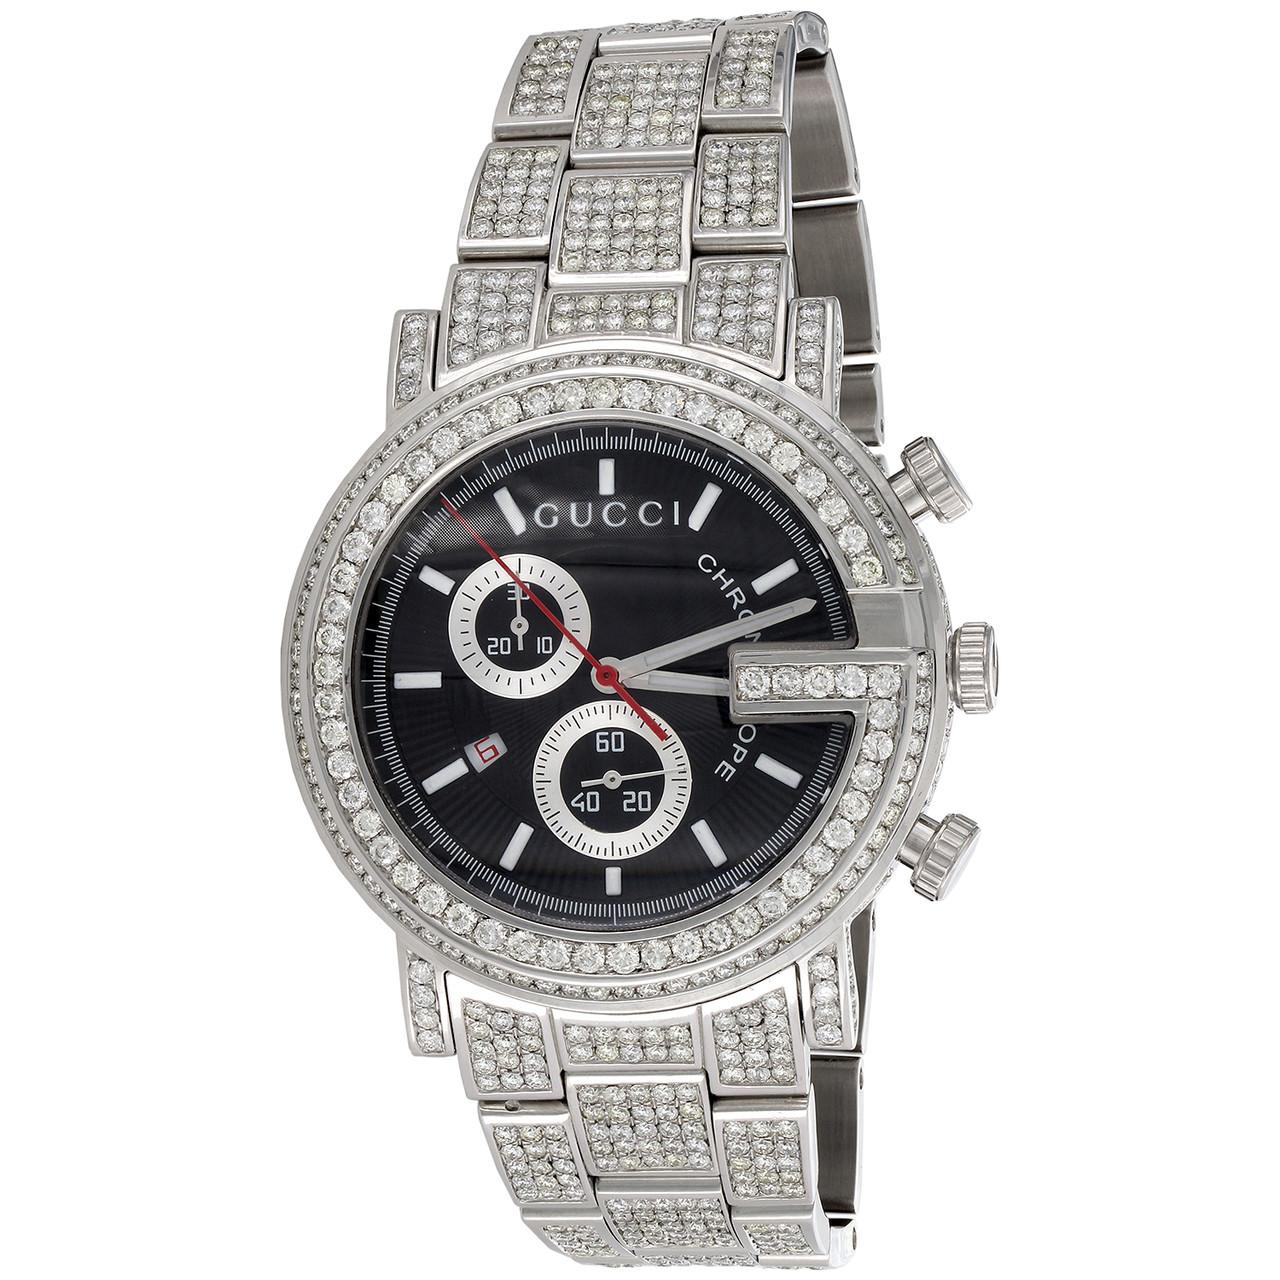 d03b45d3675 Mens Ya101309 Custom Diamond Gucci G-Watch Black Dial 44mm ...